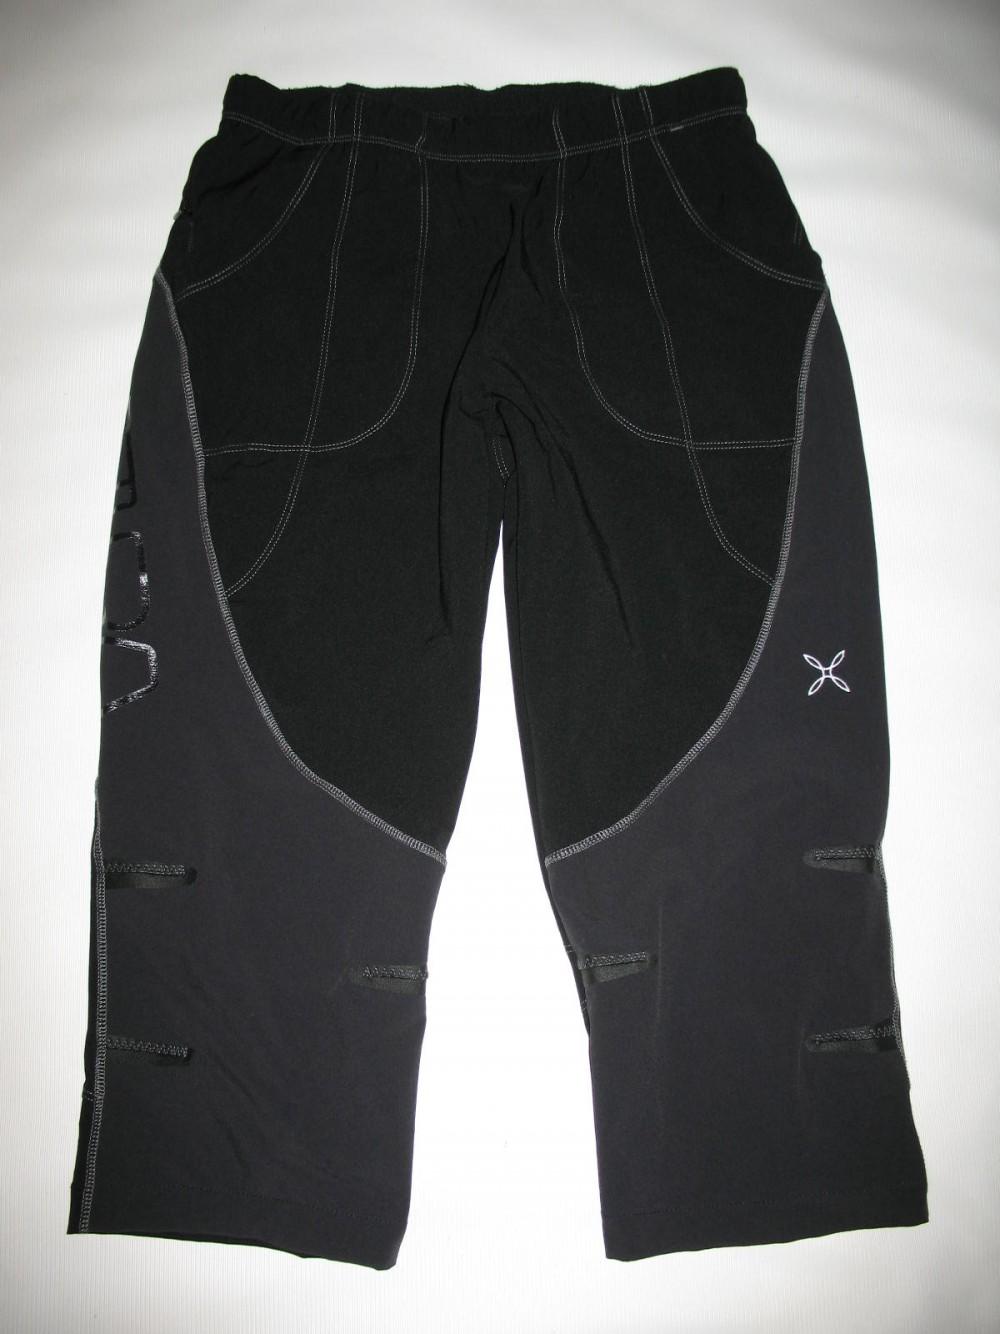 Шорты MONTURA free synt up 34 climbing shorts (размер M/S) - 1